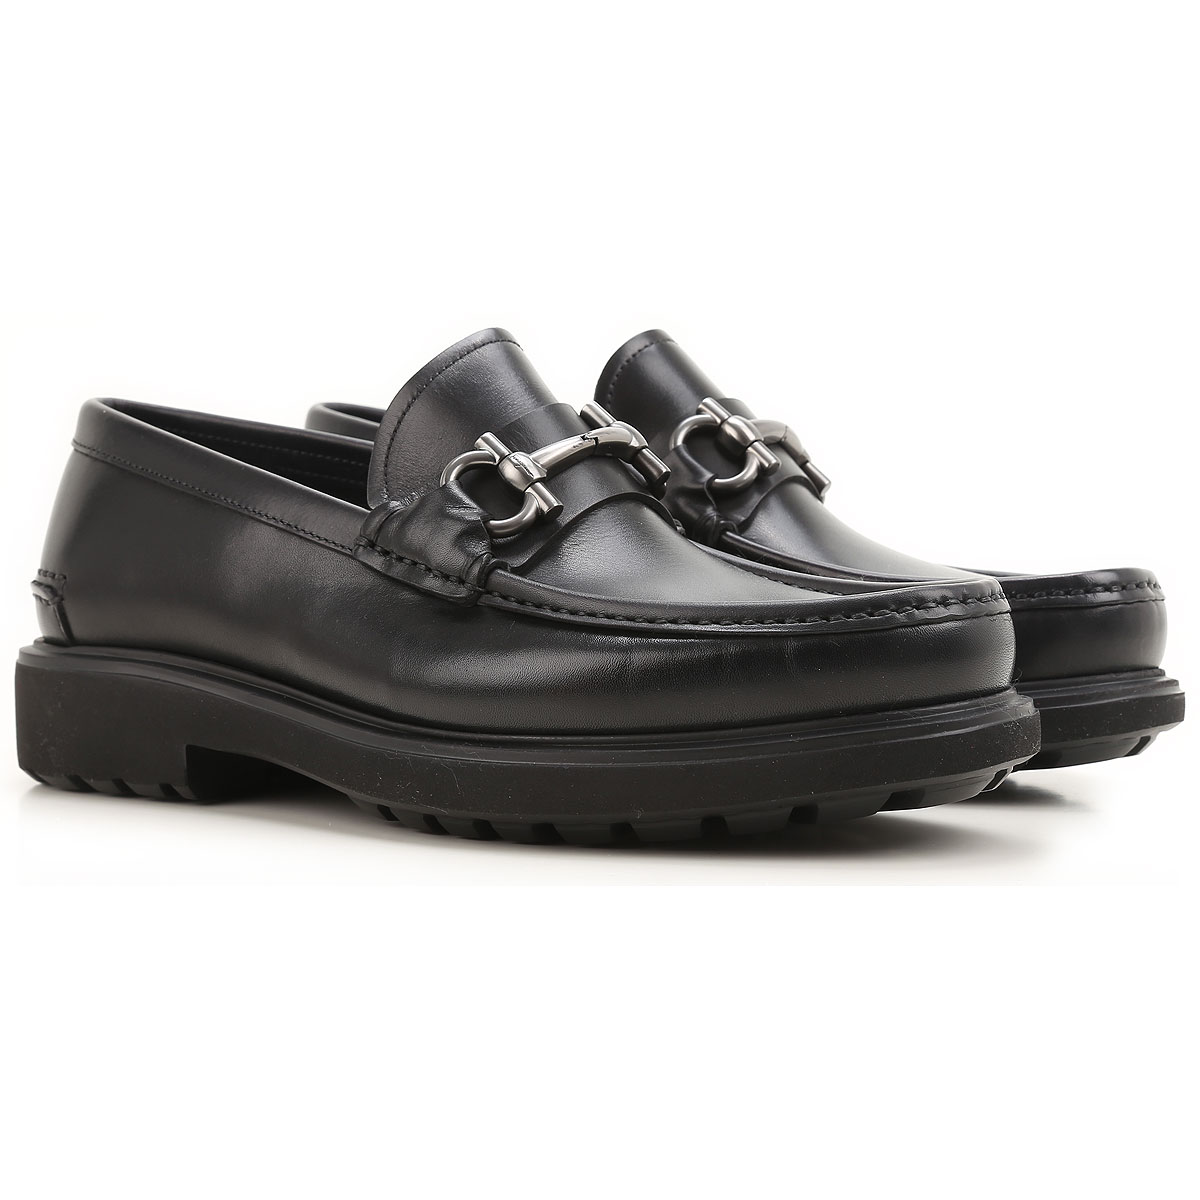 Image of Salvatore Ferragamo Loafers for Men On Sale, Black, Leather, 2017, 8 8.5 9 9.5